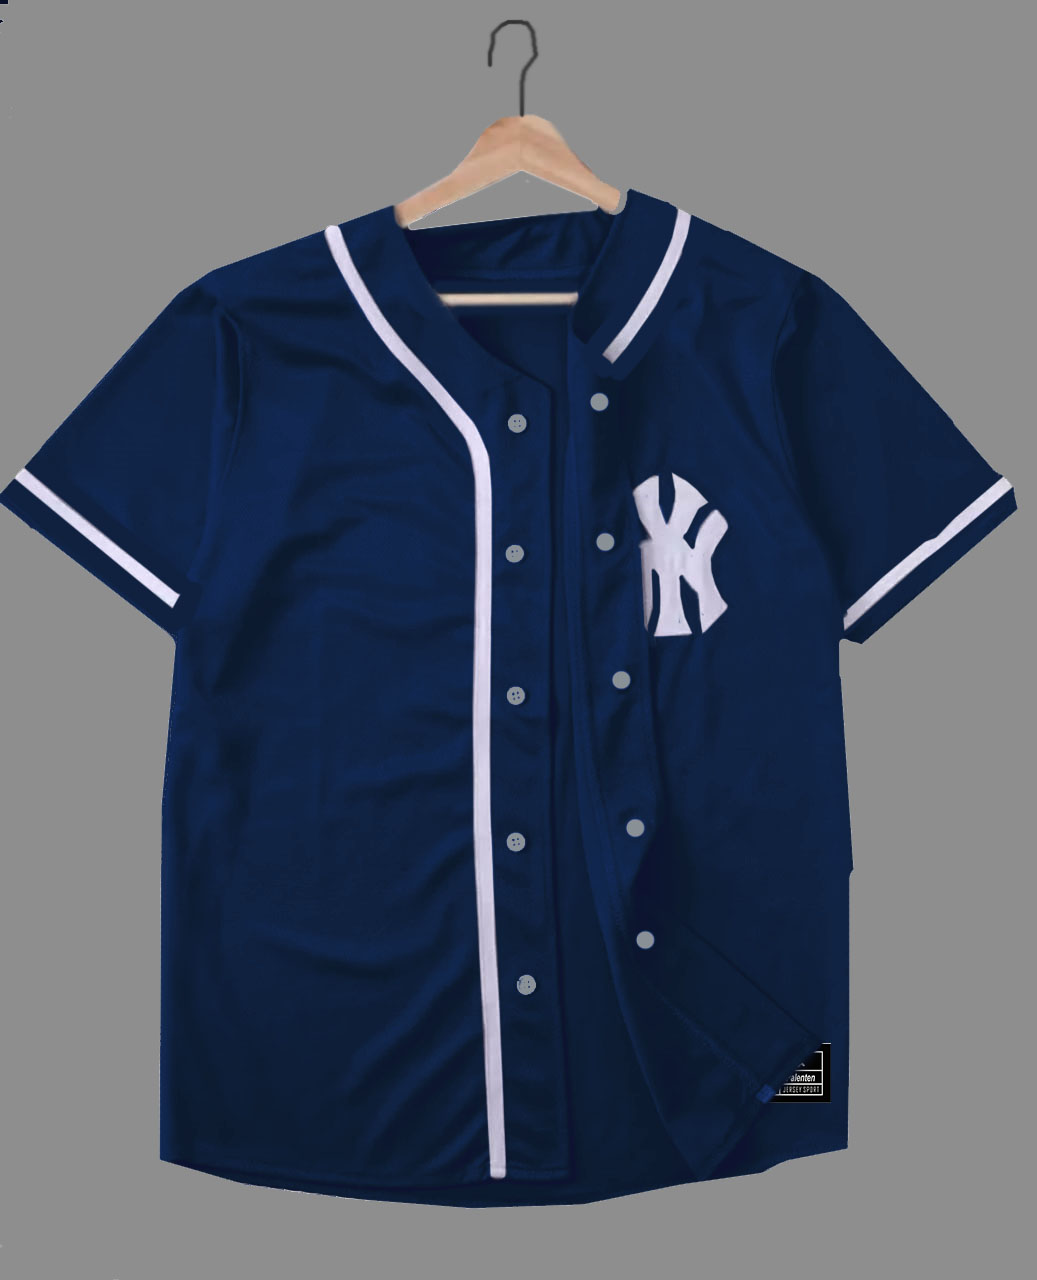 [cod] – baju baseball pink angels / jersey baseball / jersey baseball  / jersey  / baju jersey baseball  2020 / baju jersey baseball pria wanita / jersey baseball